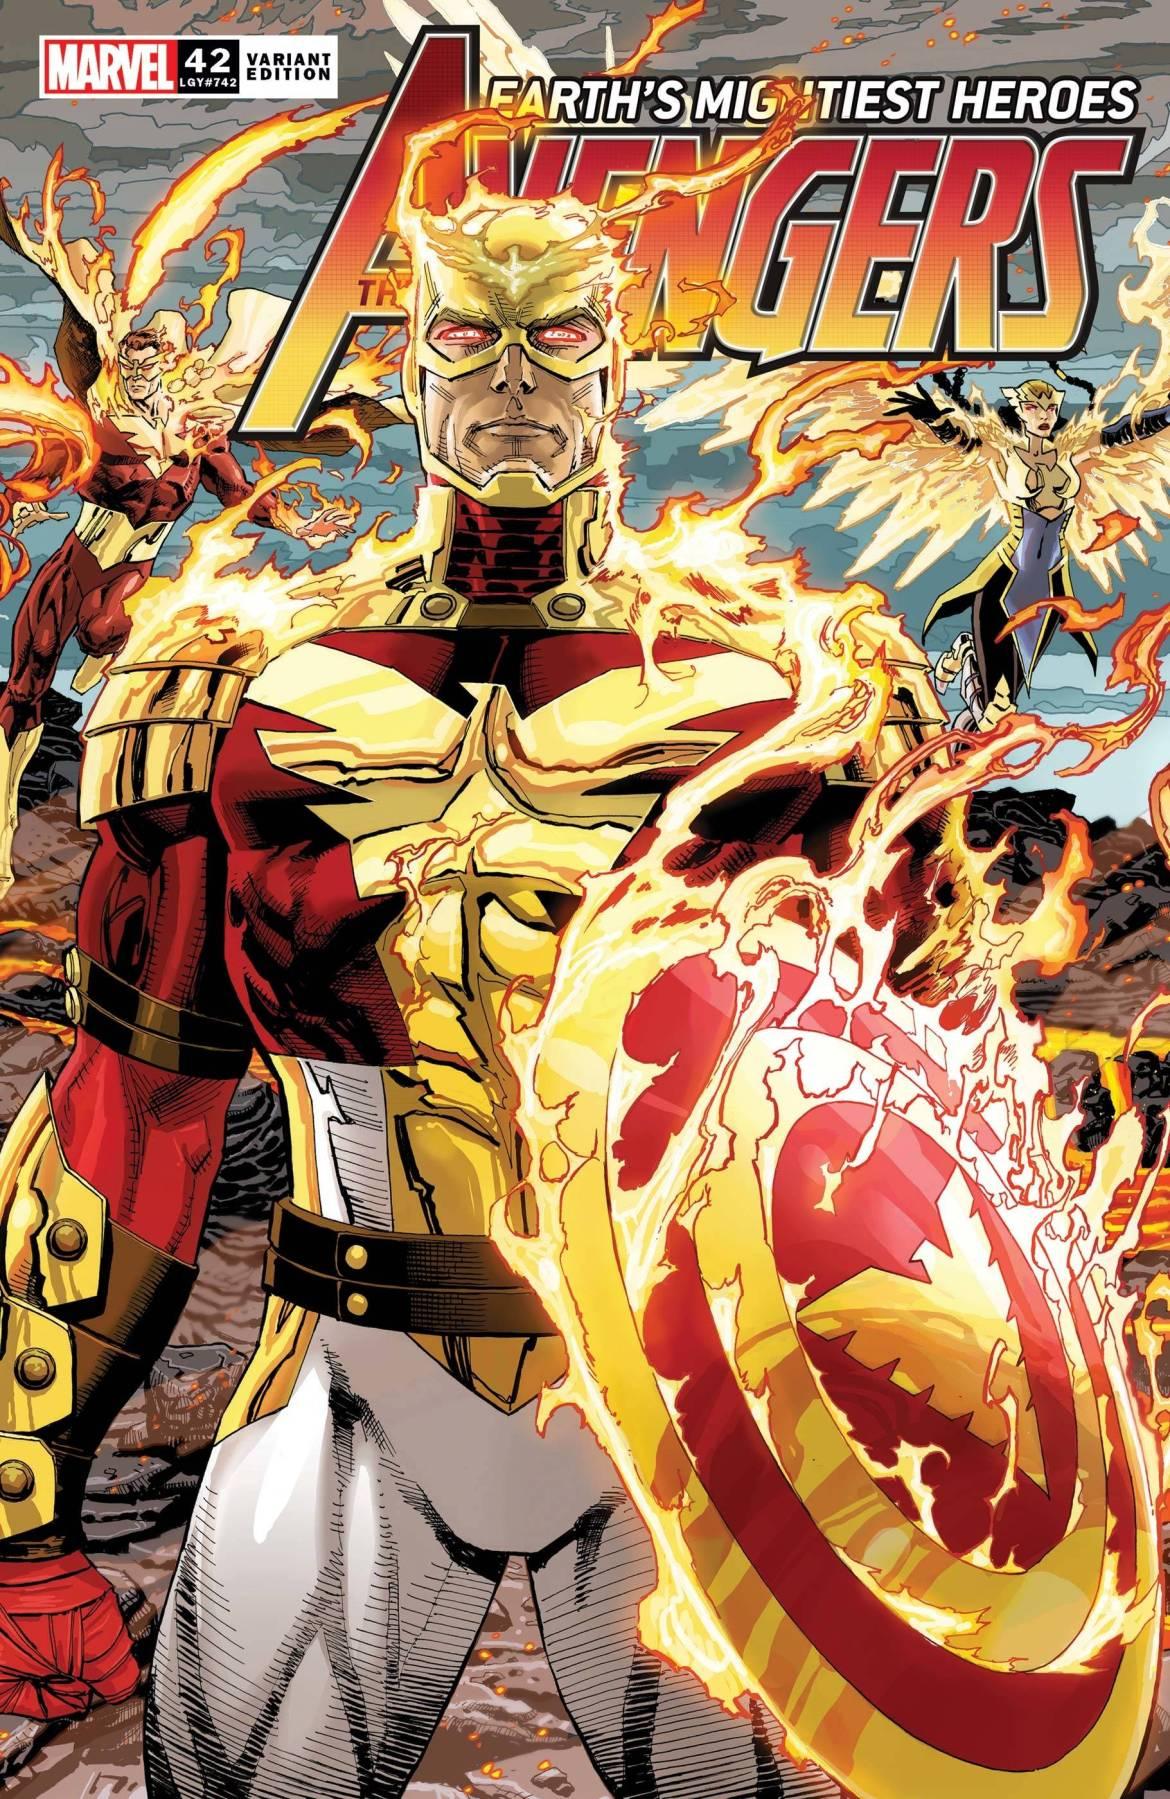 STL177393 ComicList: Marvel Comics New Releases for 02/03/2021